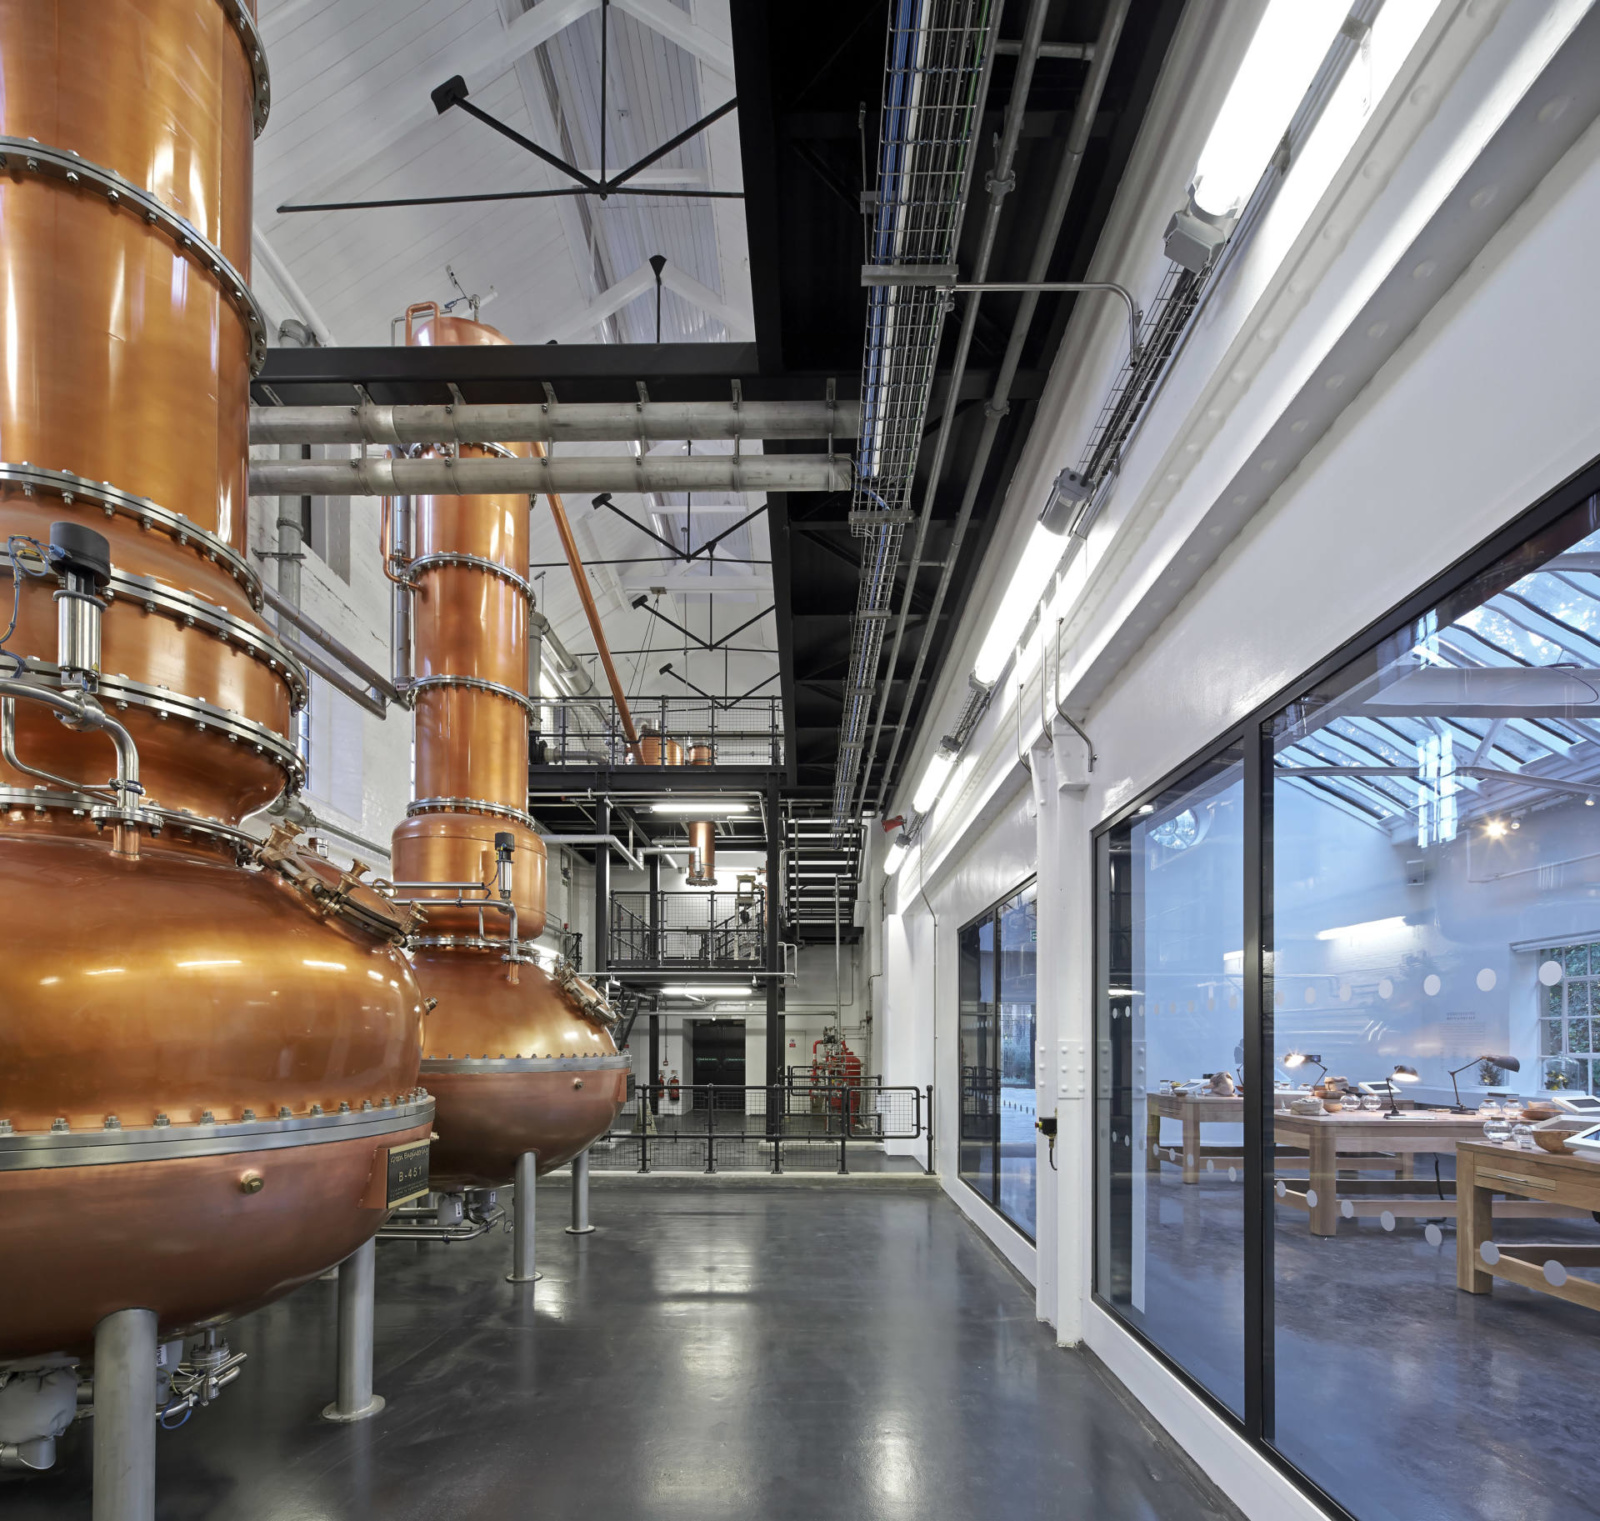 Bombay Sapphire-gin-distillery-copper-stills